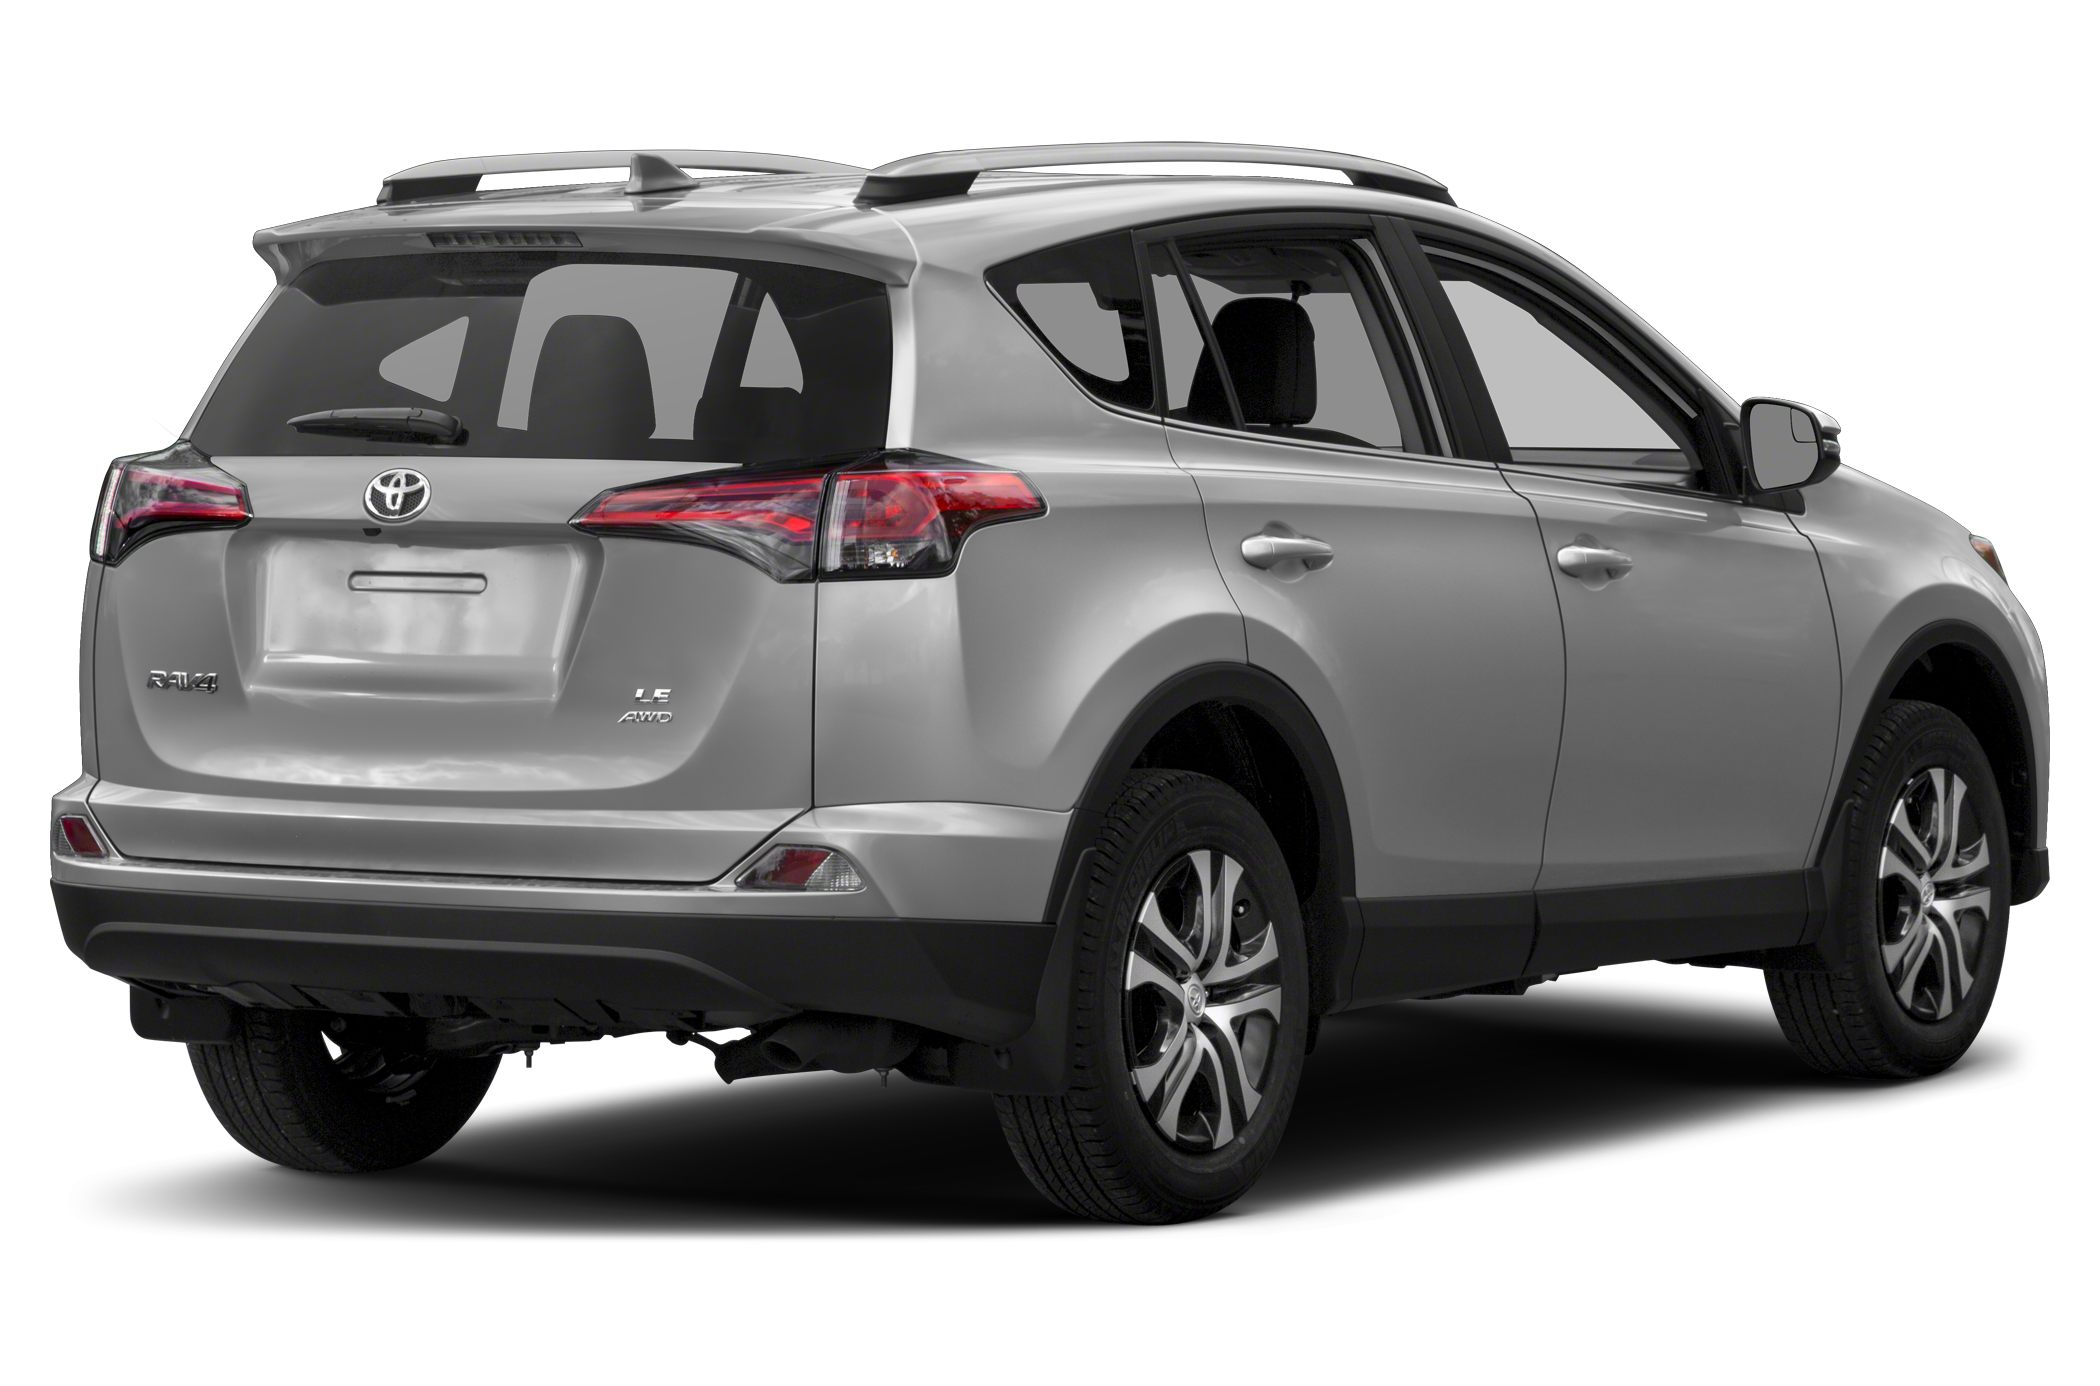 2018 Toyota Rav4 Styles Amp Features Highlights